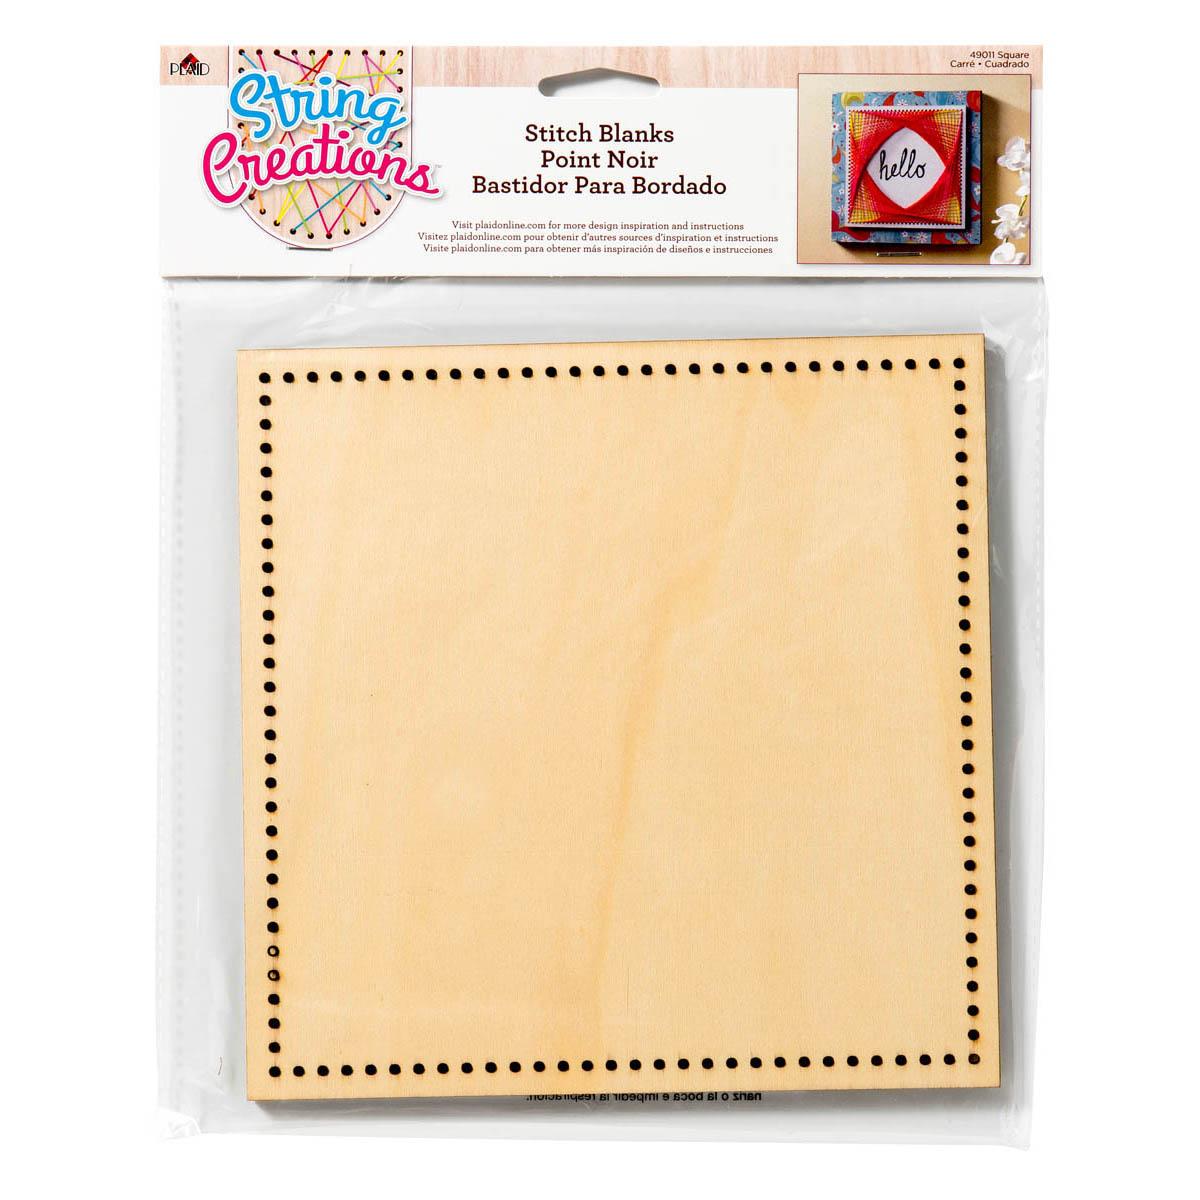 Bucilla ® String Creations™ Stitch Blanks - Square, Border Grid